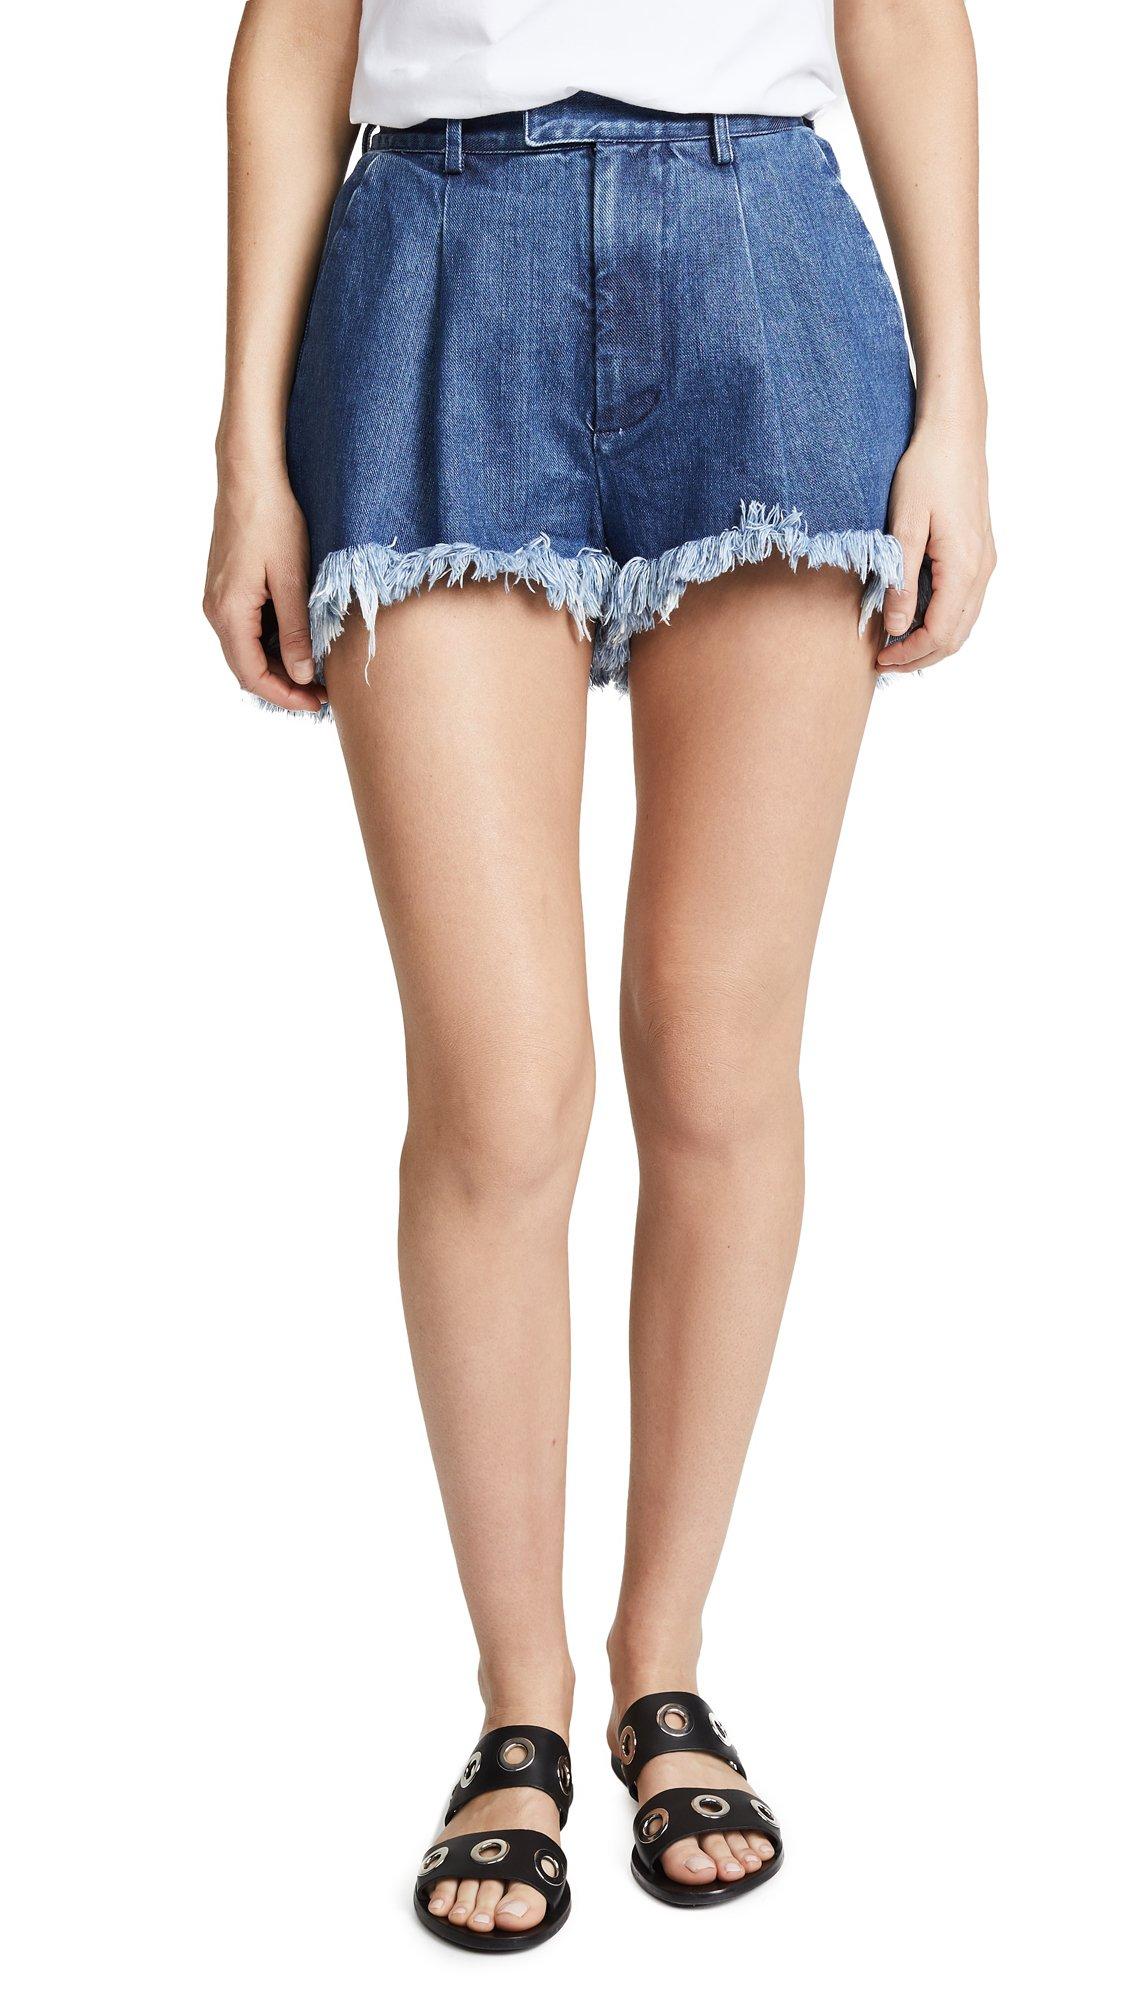 Ksenia Schnaider Women's Fringe Short Shorts, Medium Blue, Large